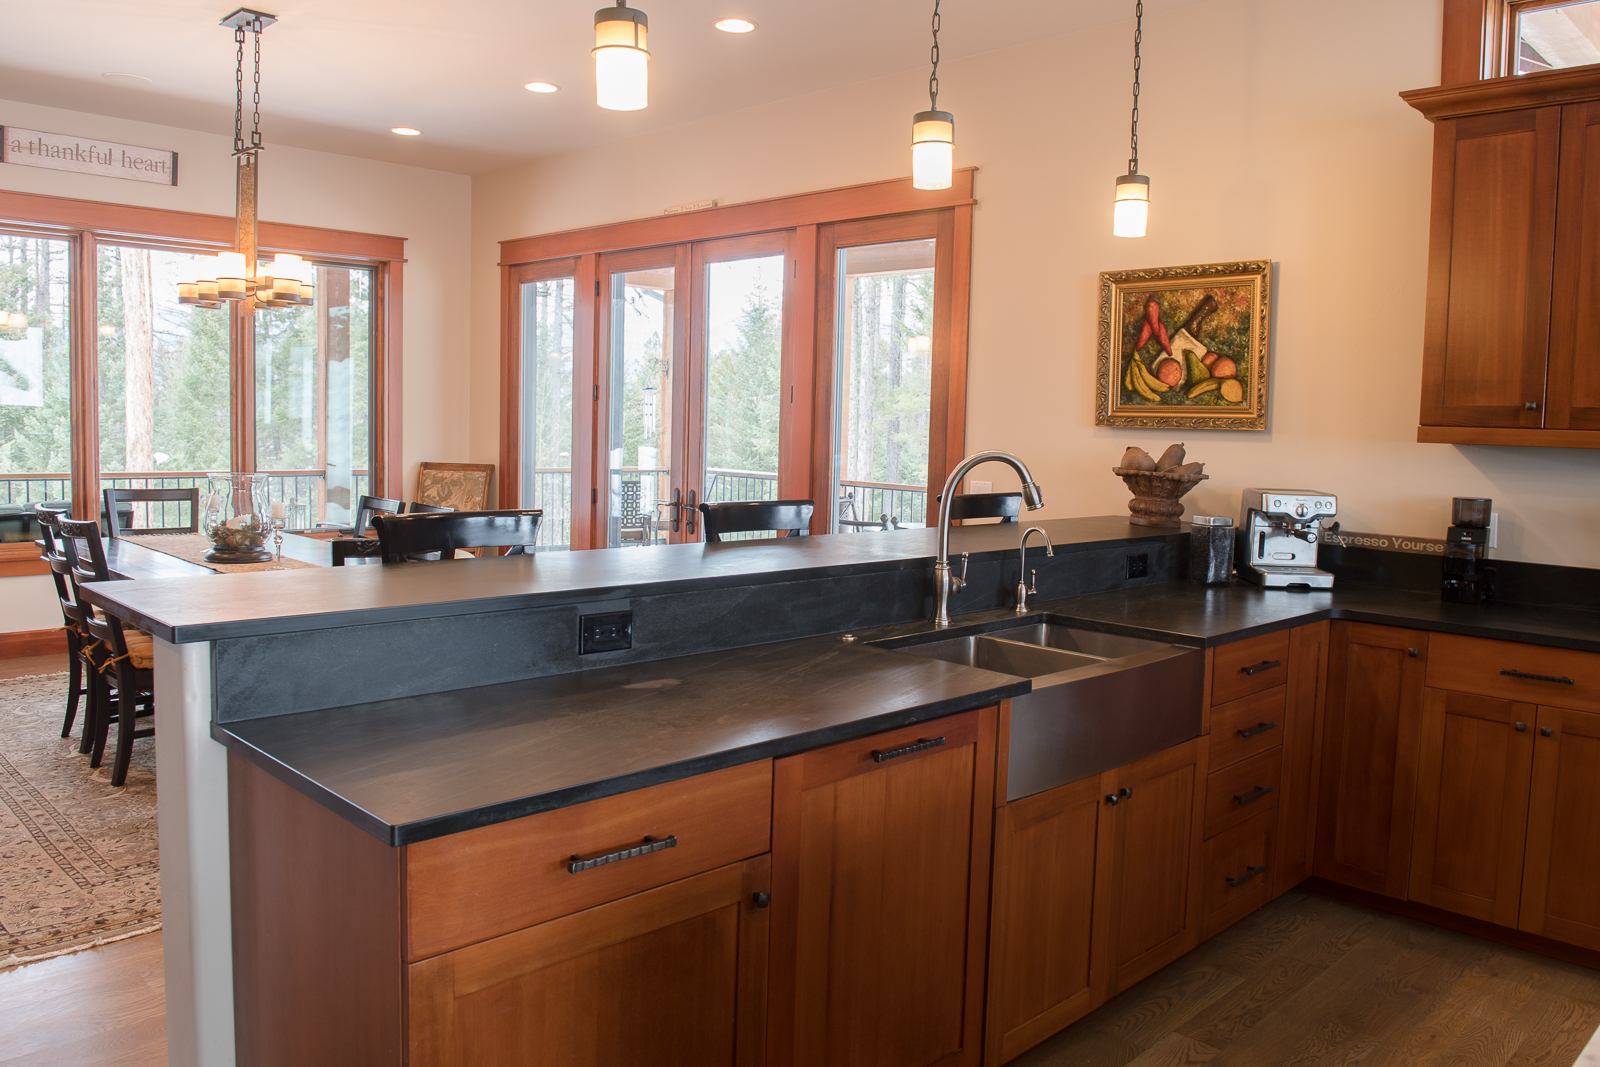 Woodworks-West-Bozeman-Montana-Builder-Cabinetry-Remodel-New-Construction-3561.jpg